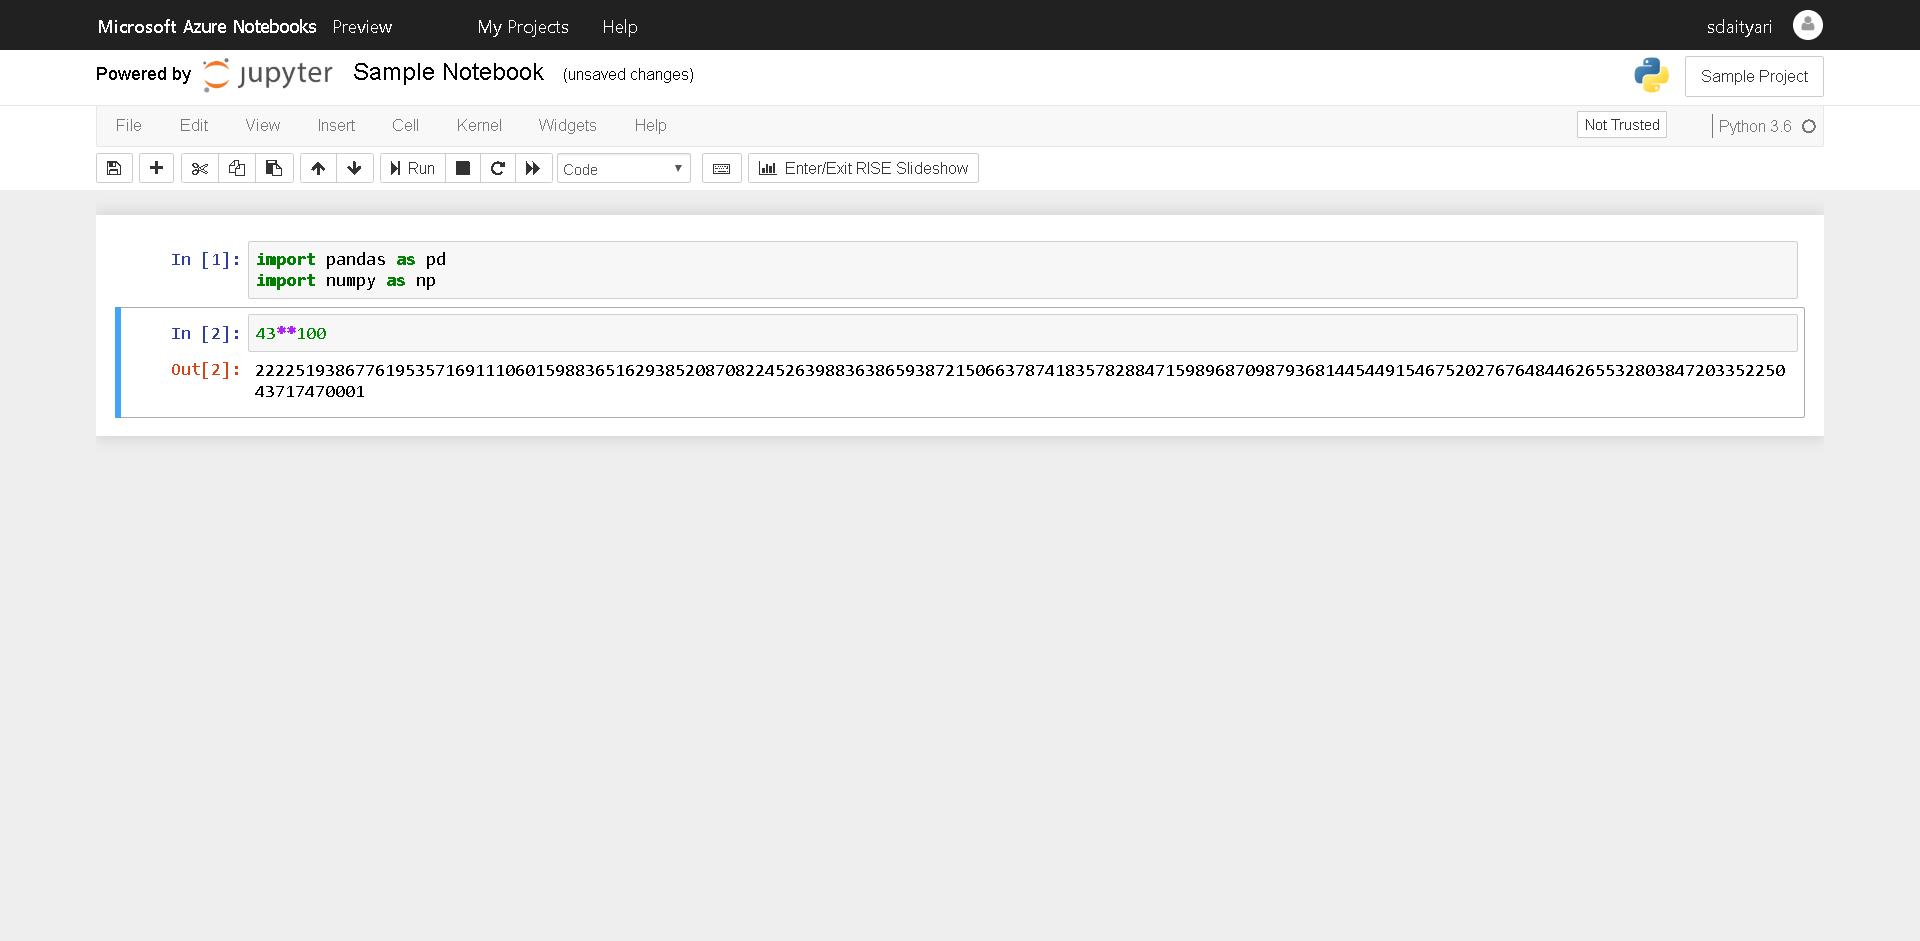 Jupyter Notebook on Azure